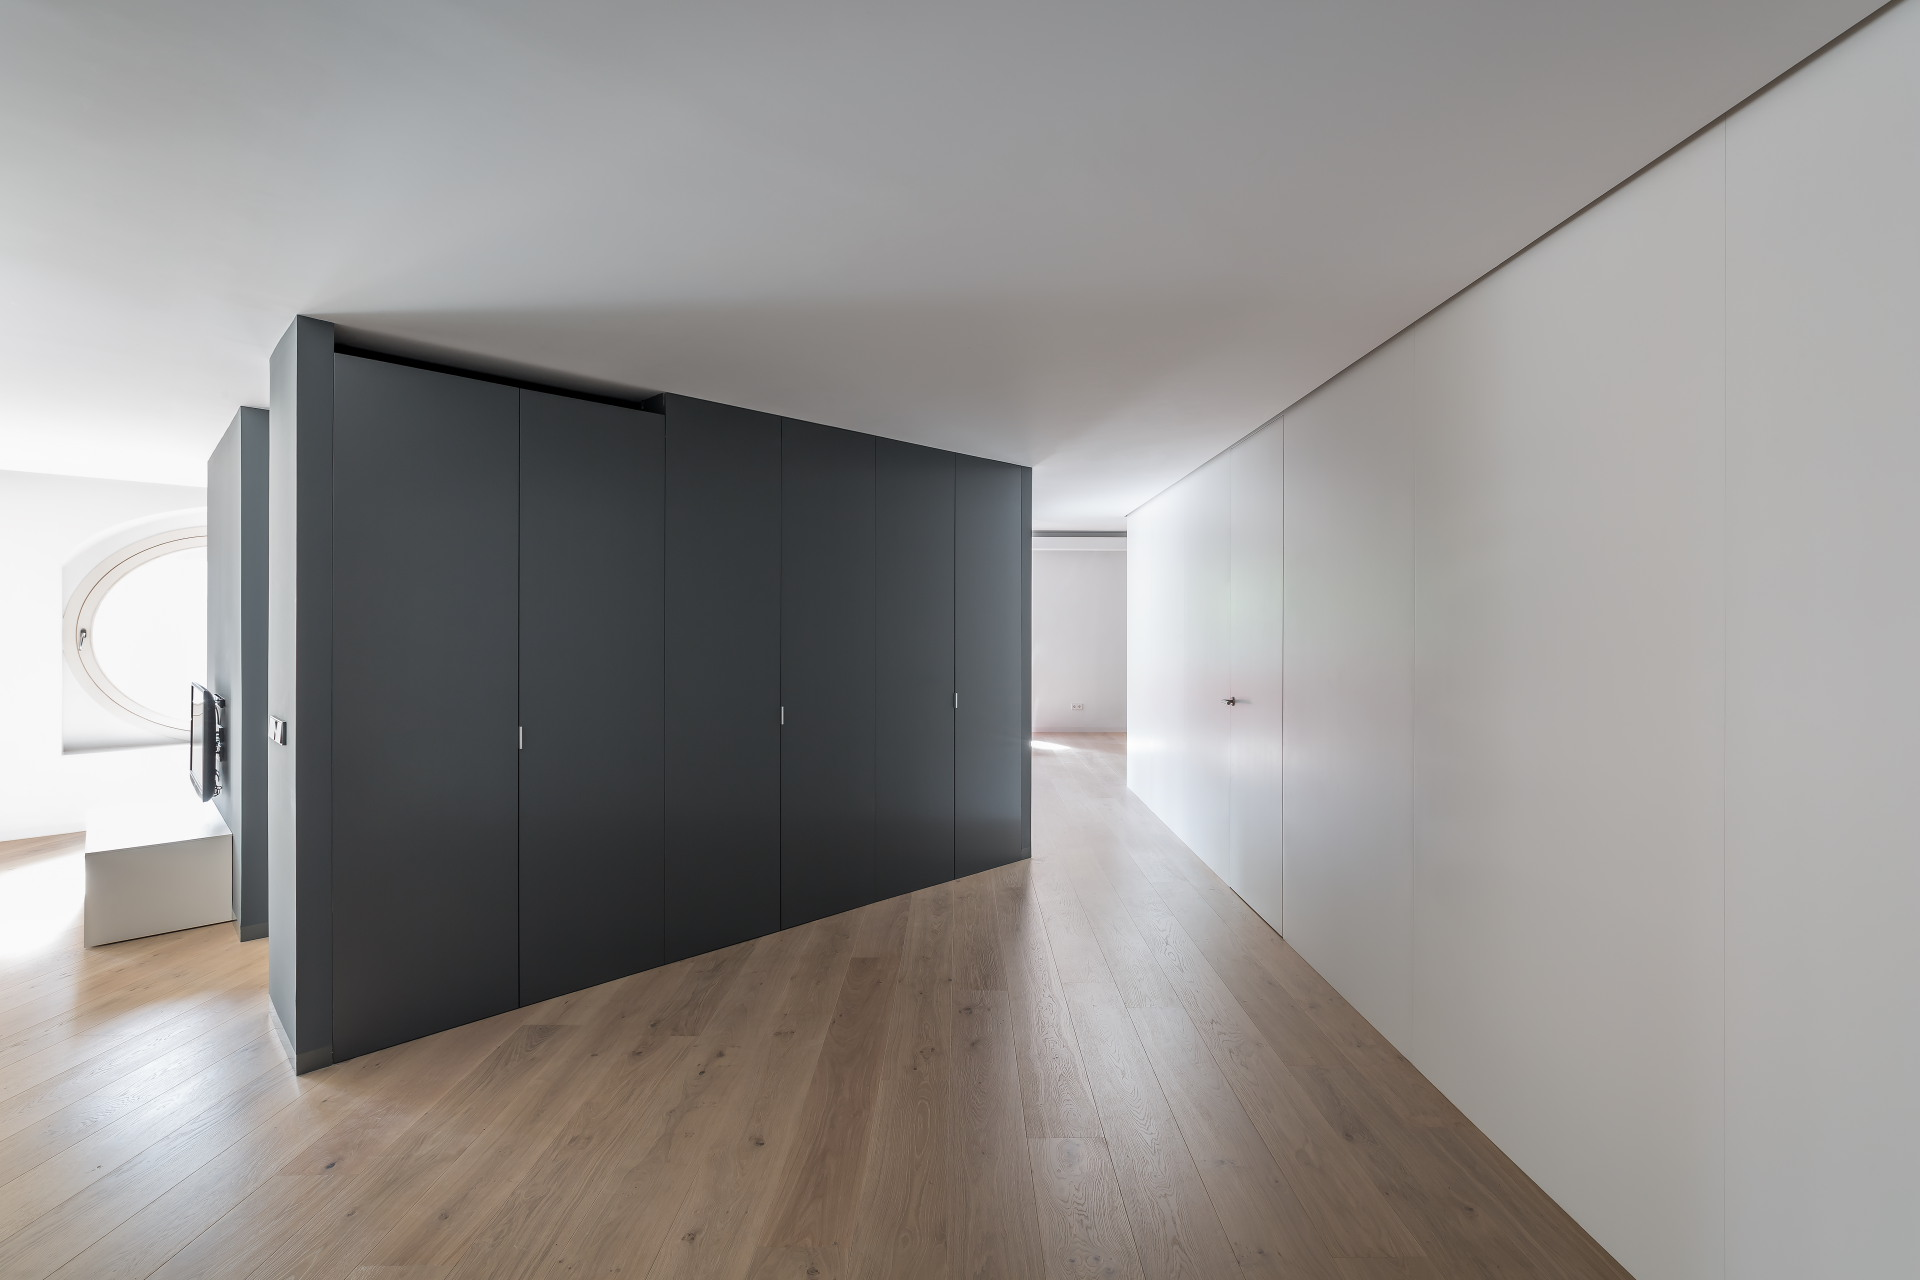 fotografia-arquitectura-interiorismo-valencia-german-cabo-gallardo-llopis-bfm-edificatoria-turia02 (1)